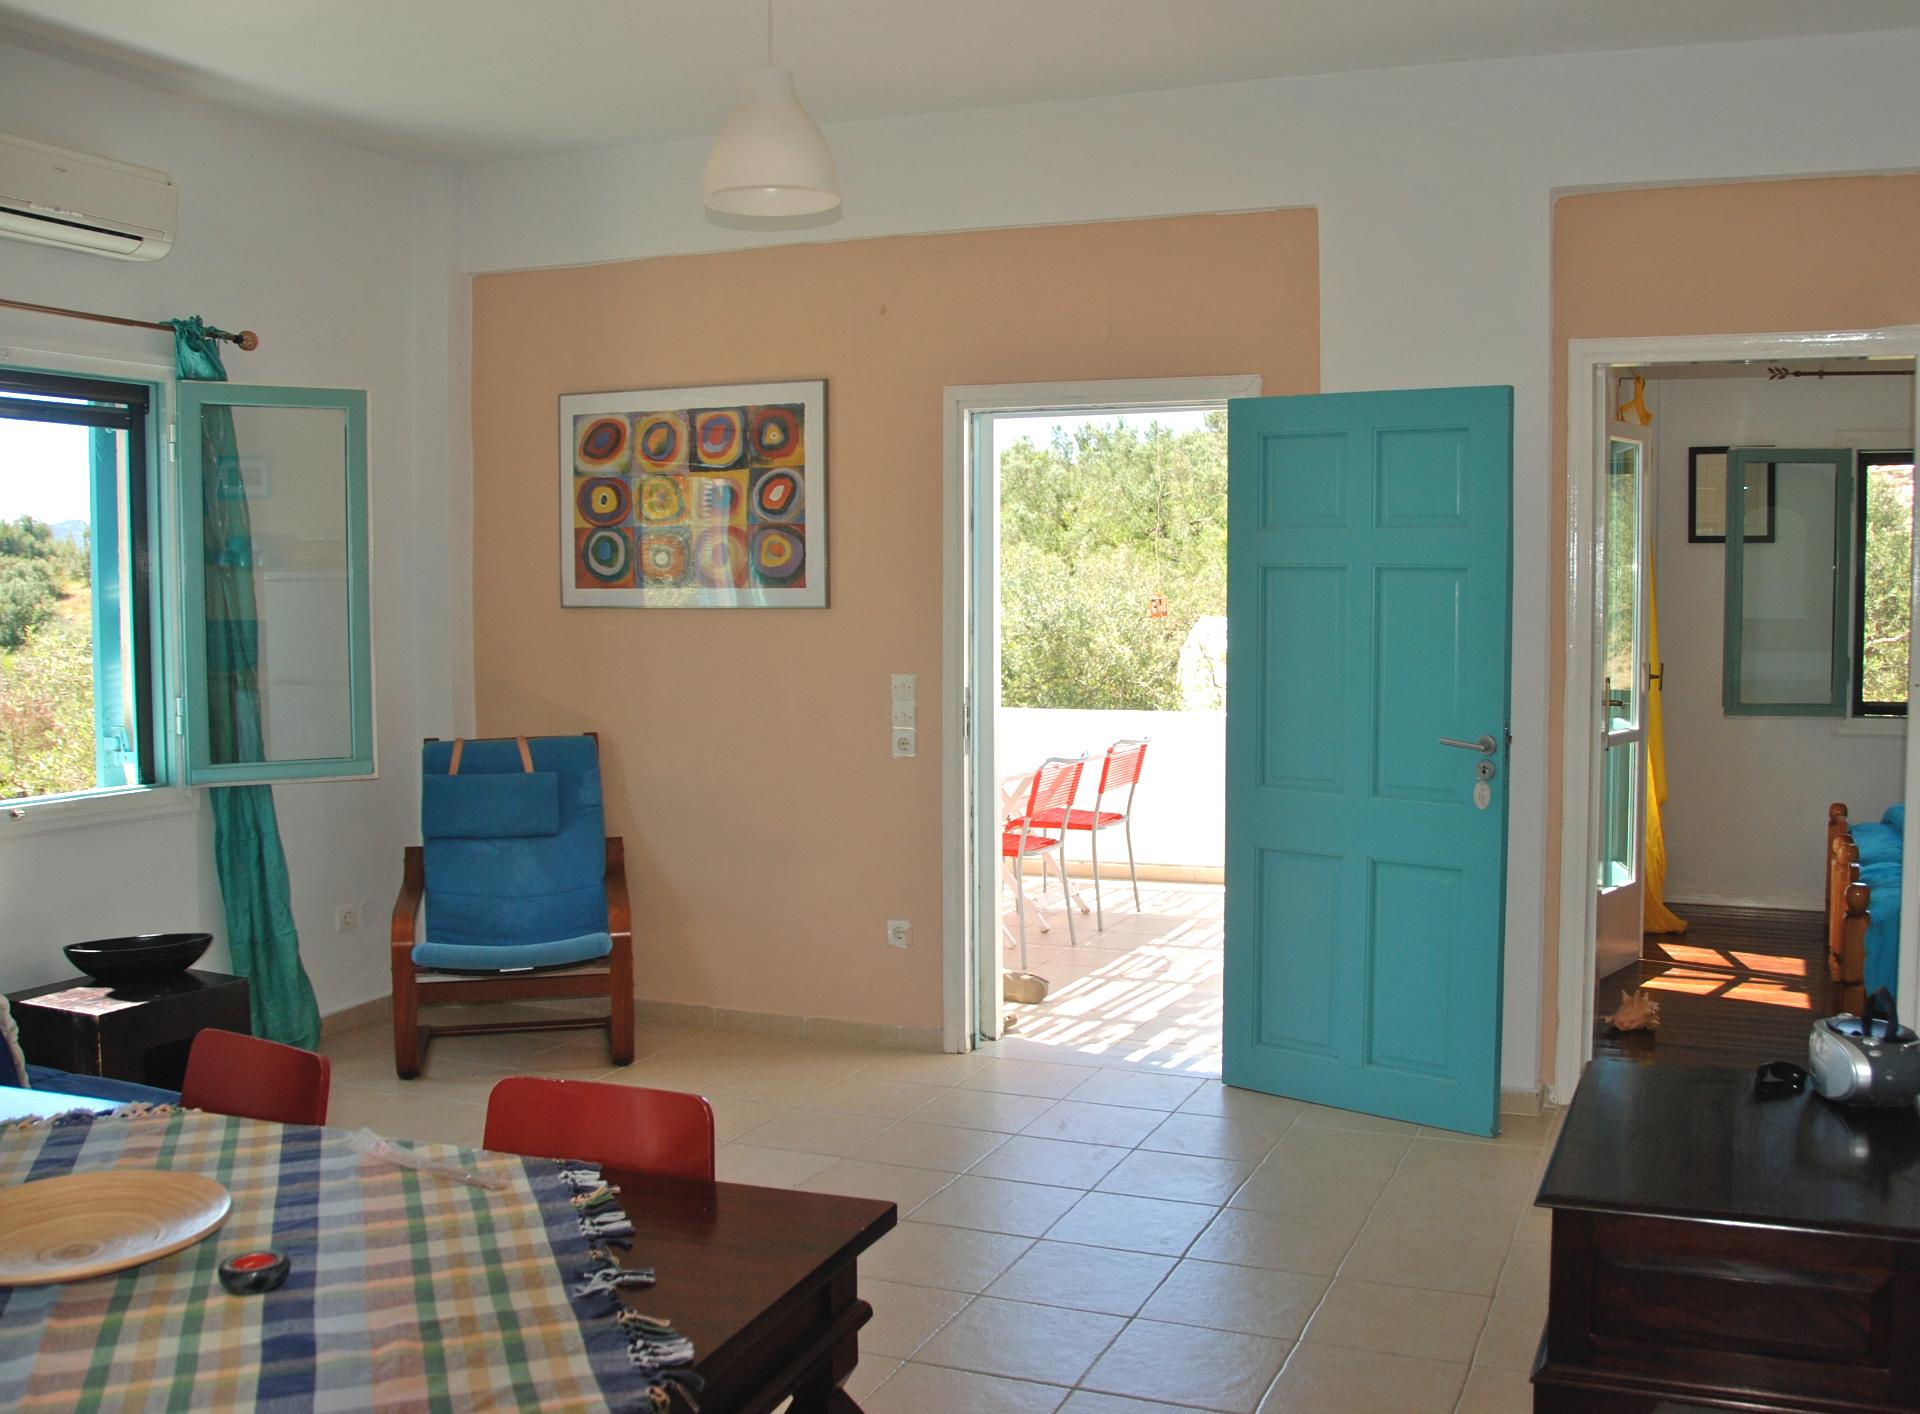 2 bedroom house, accommodates 6.